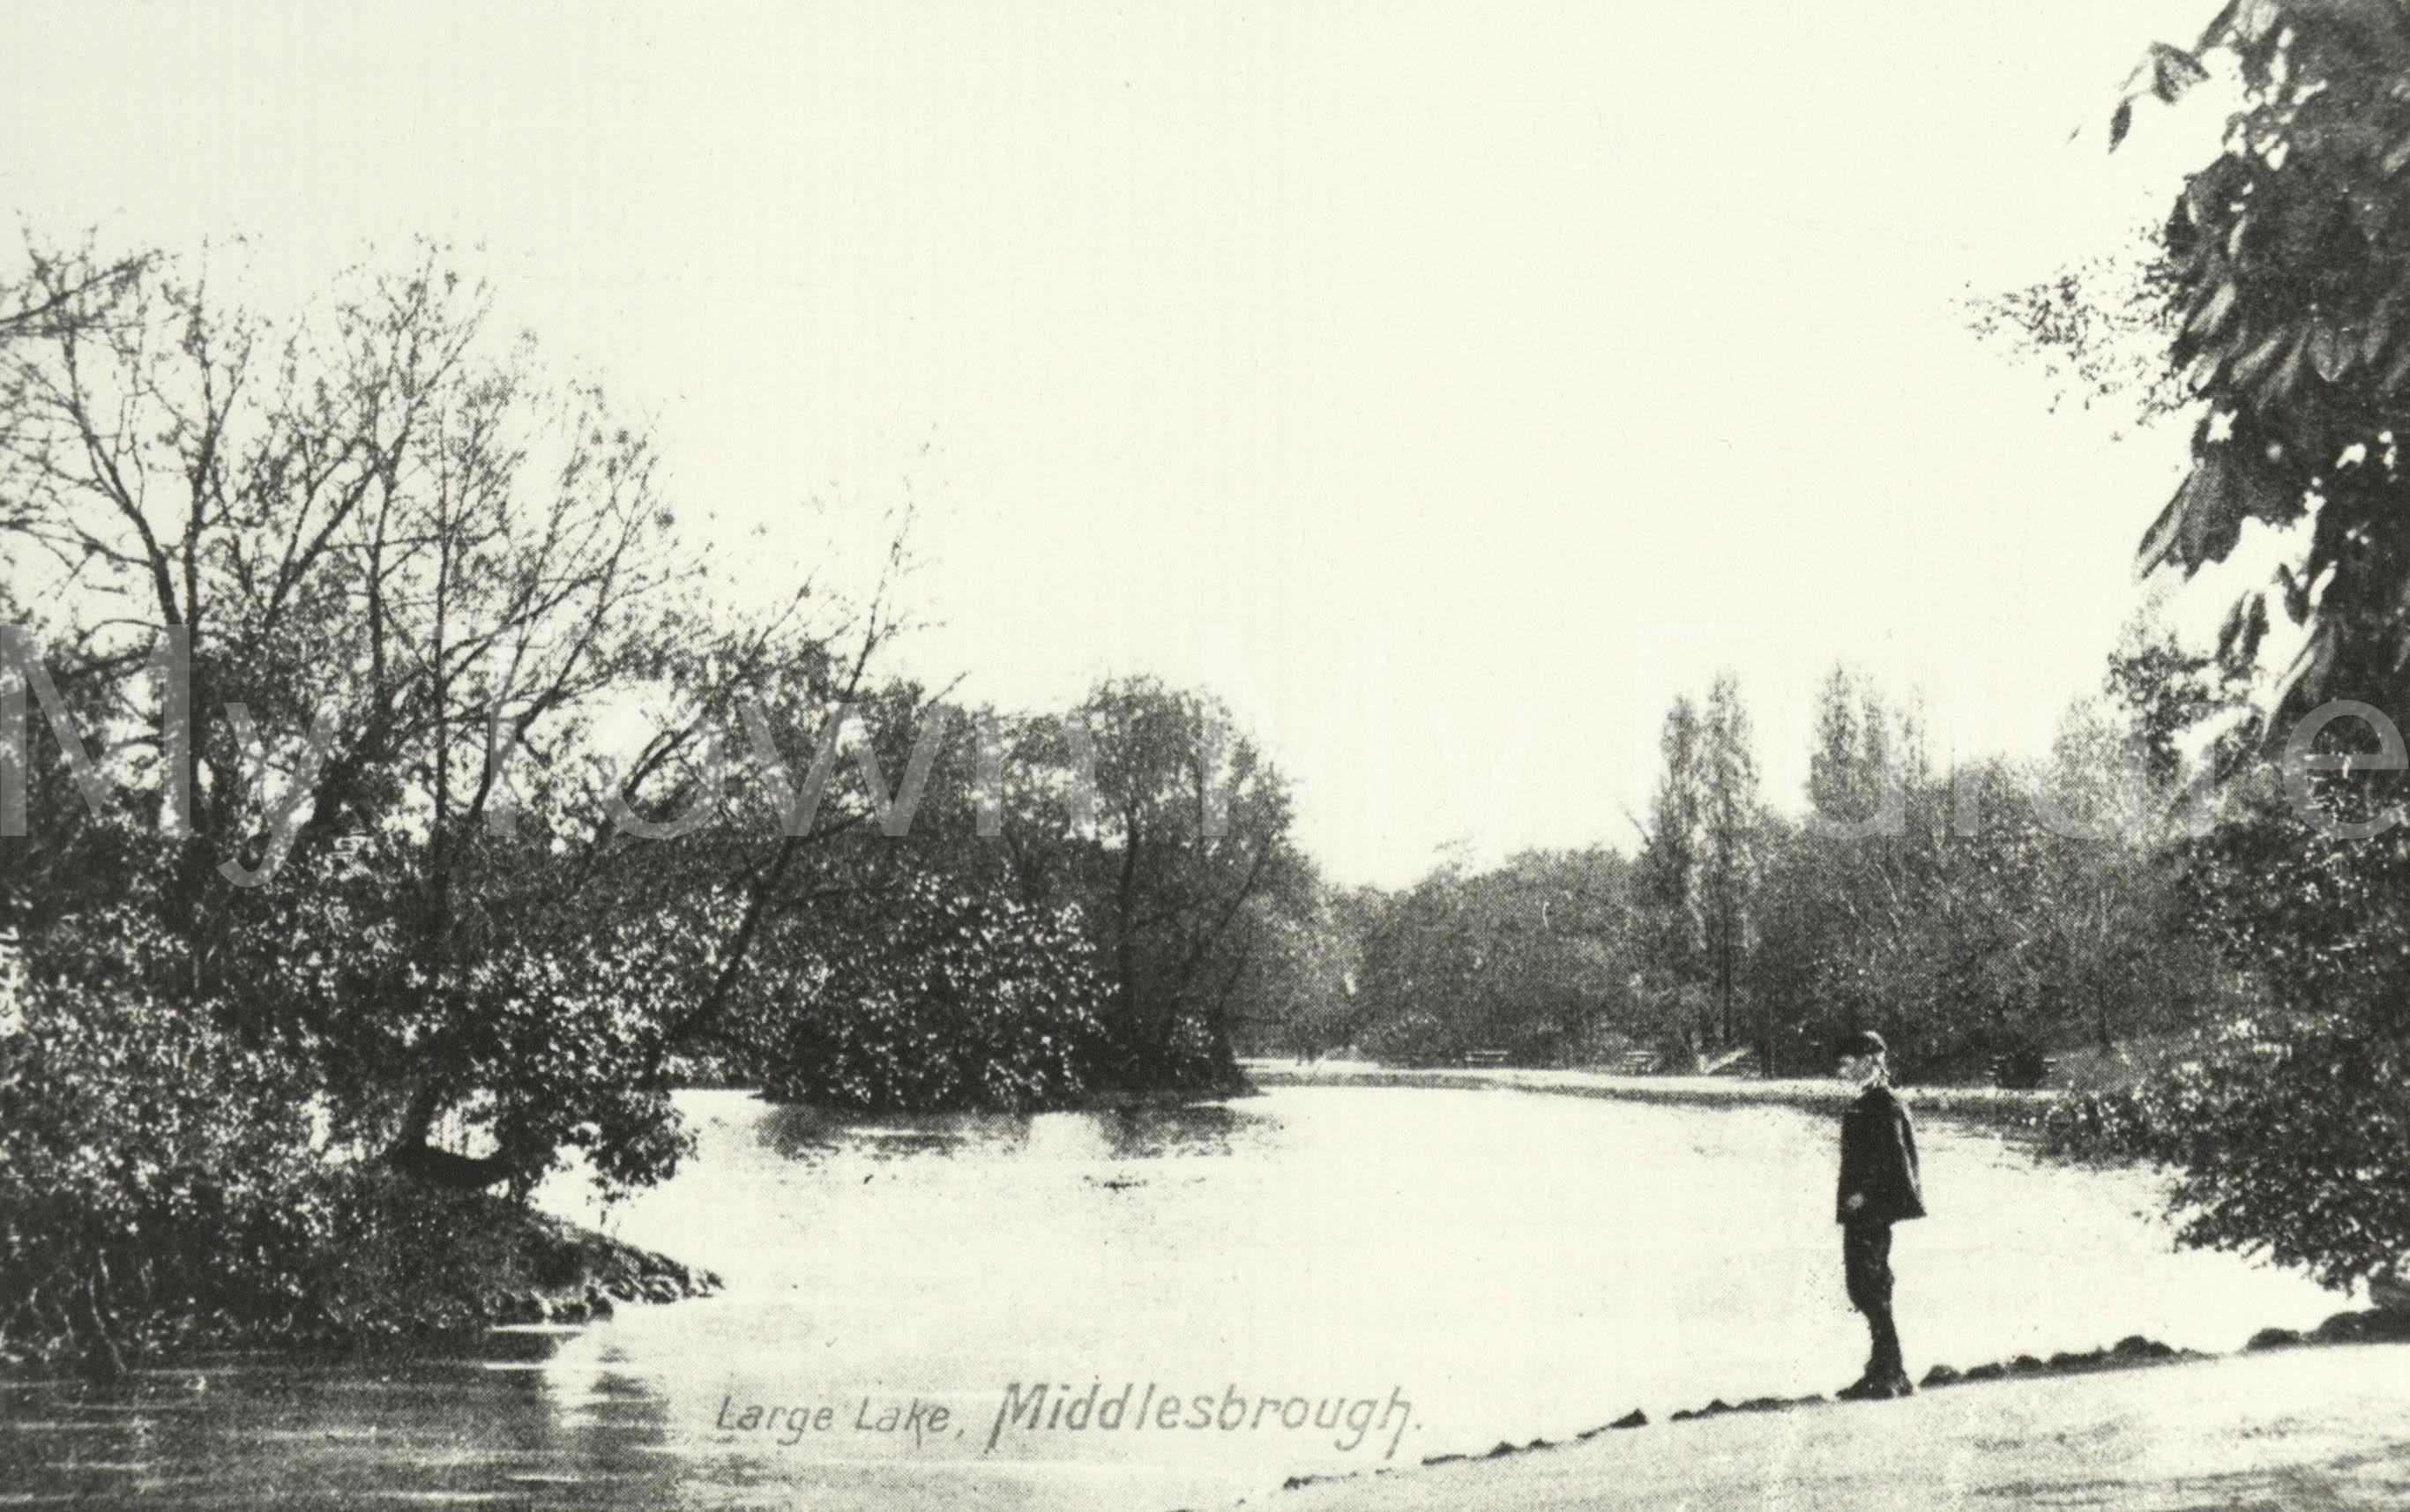 Albert Park - View of the Large Lake, 1908